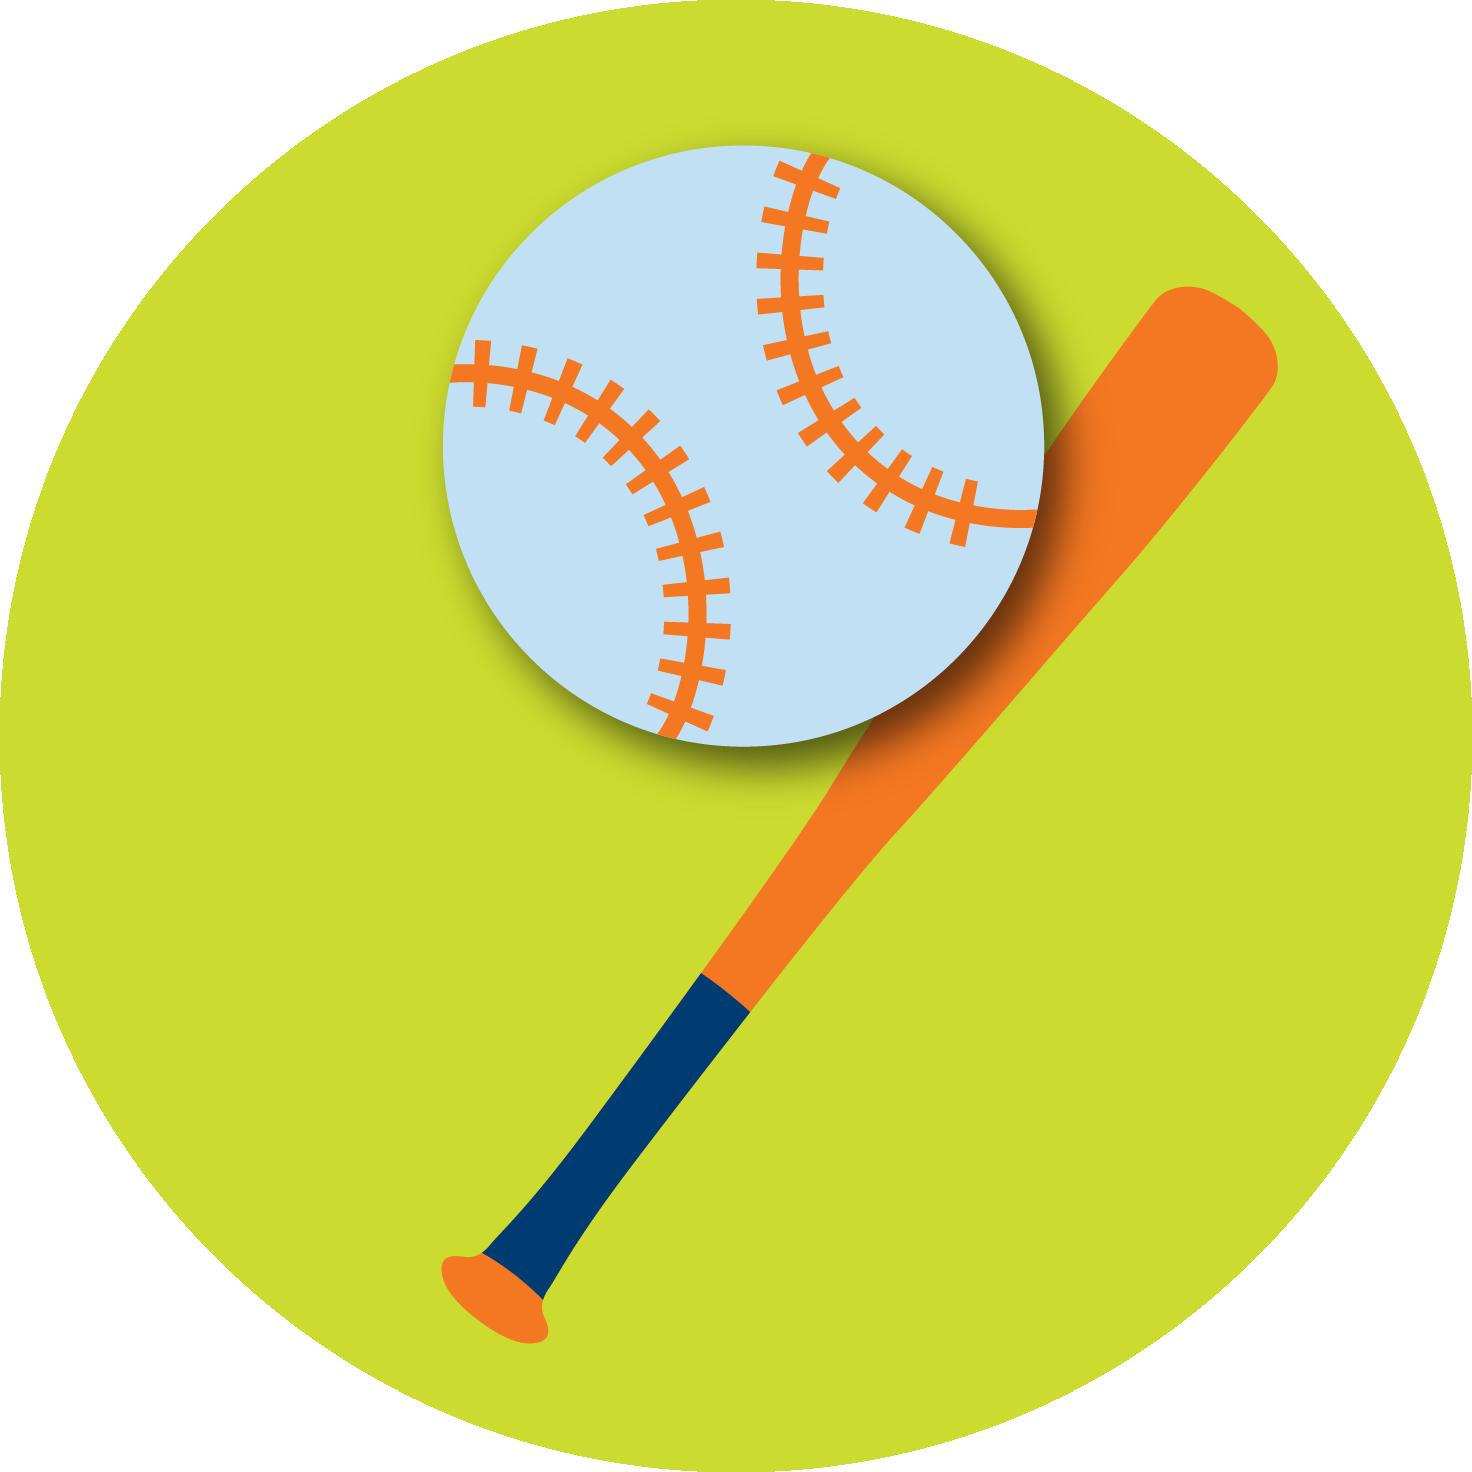 A baseball and a baseball bat.